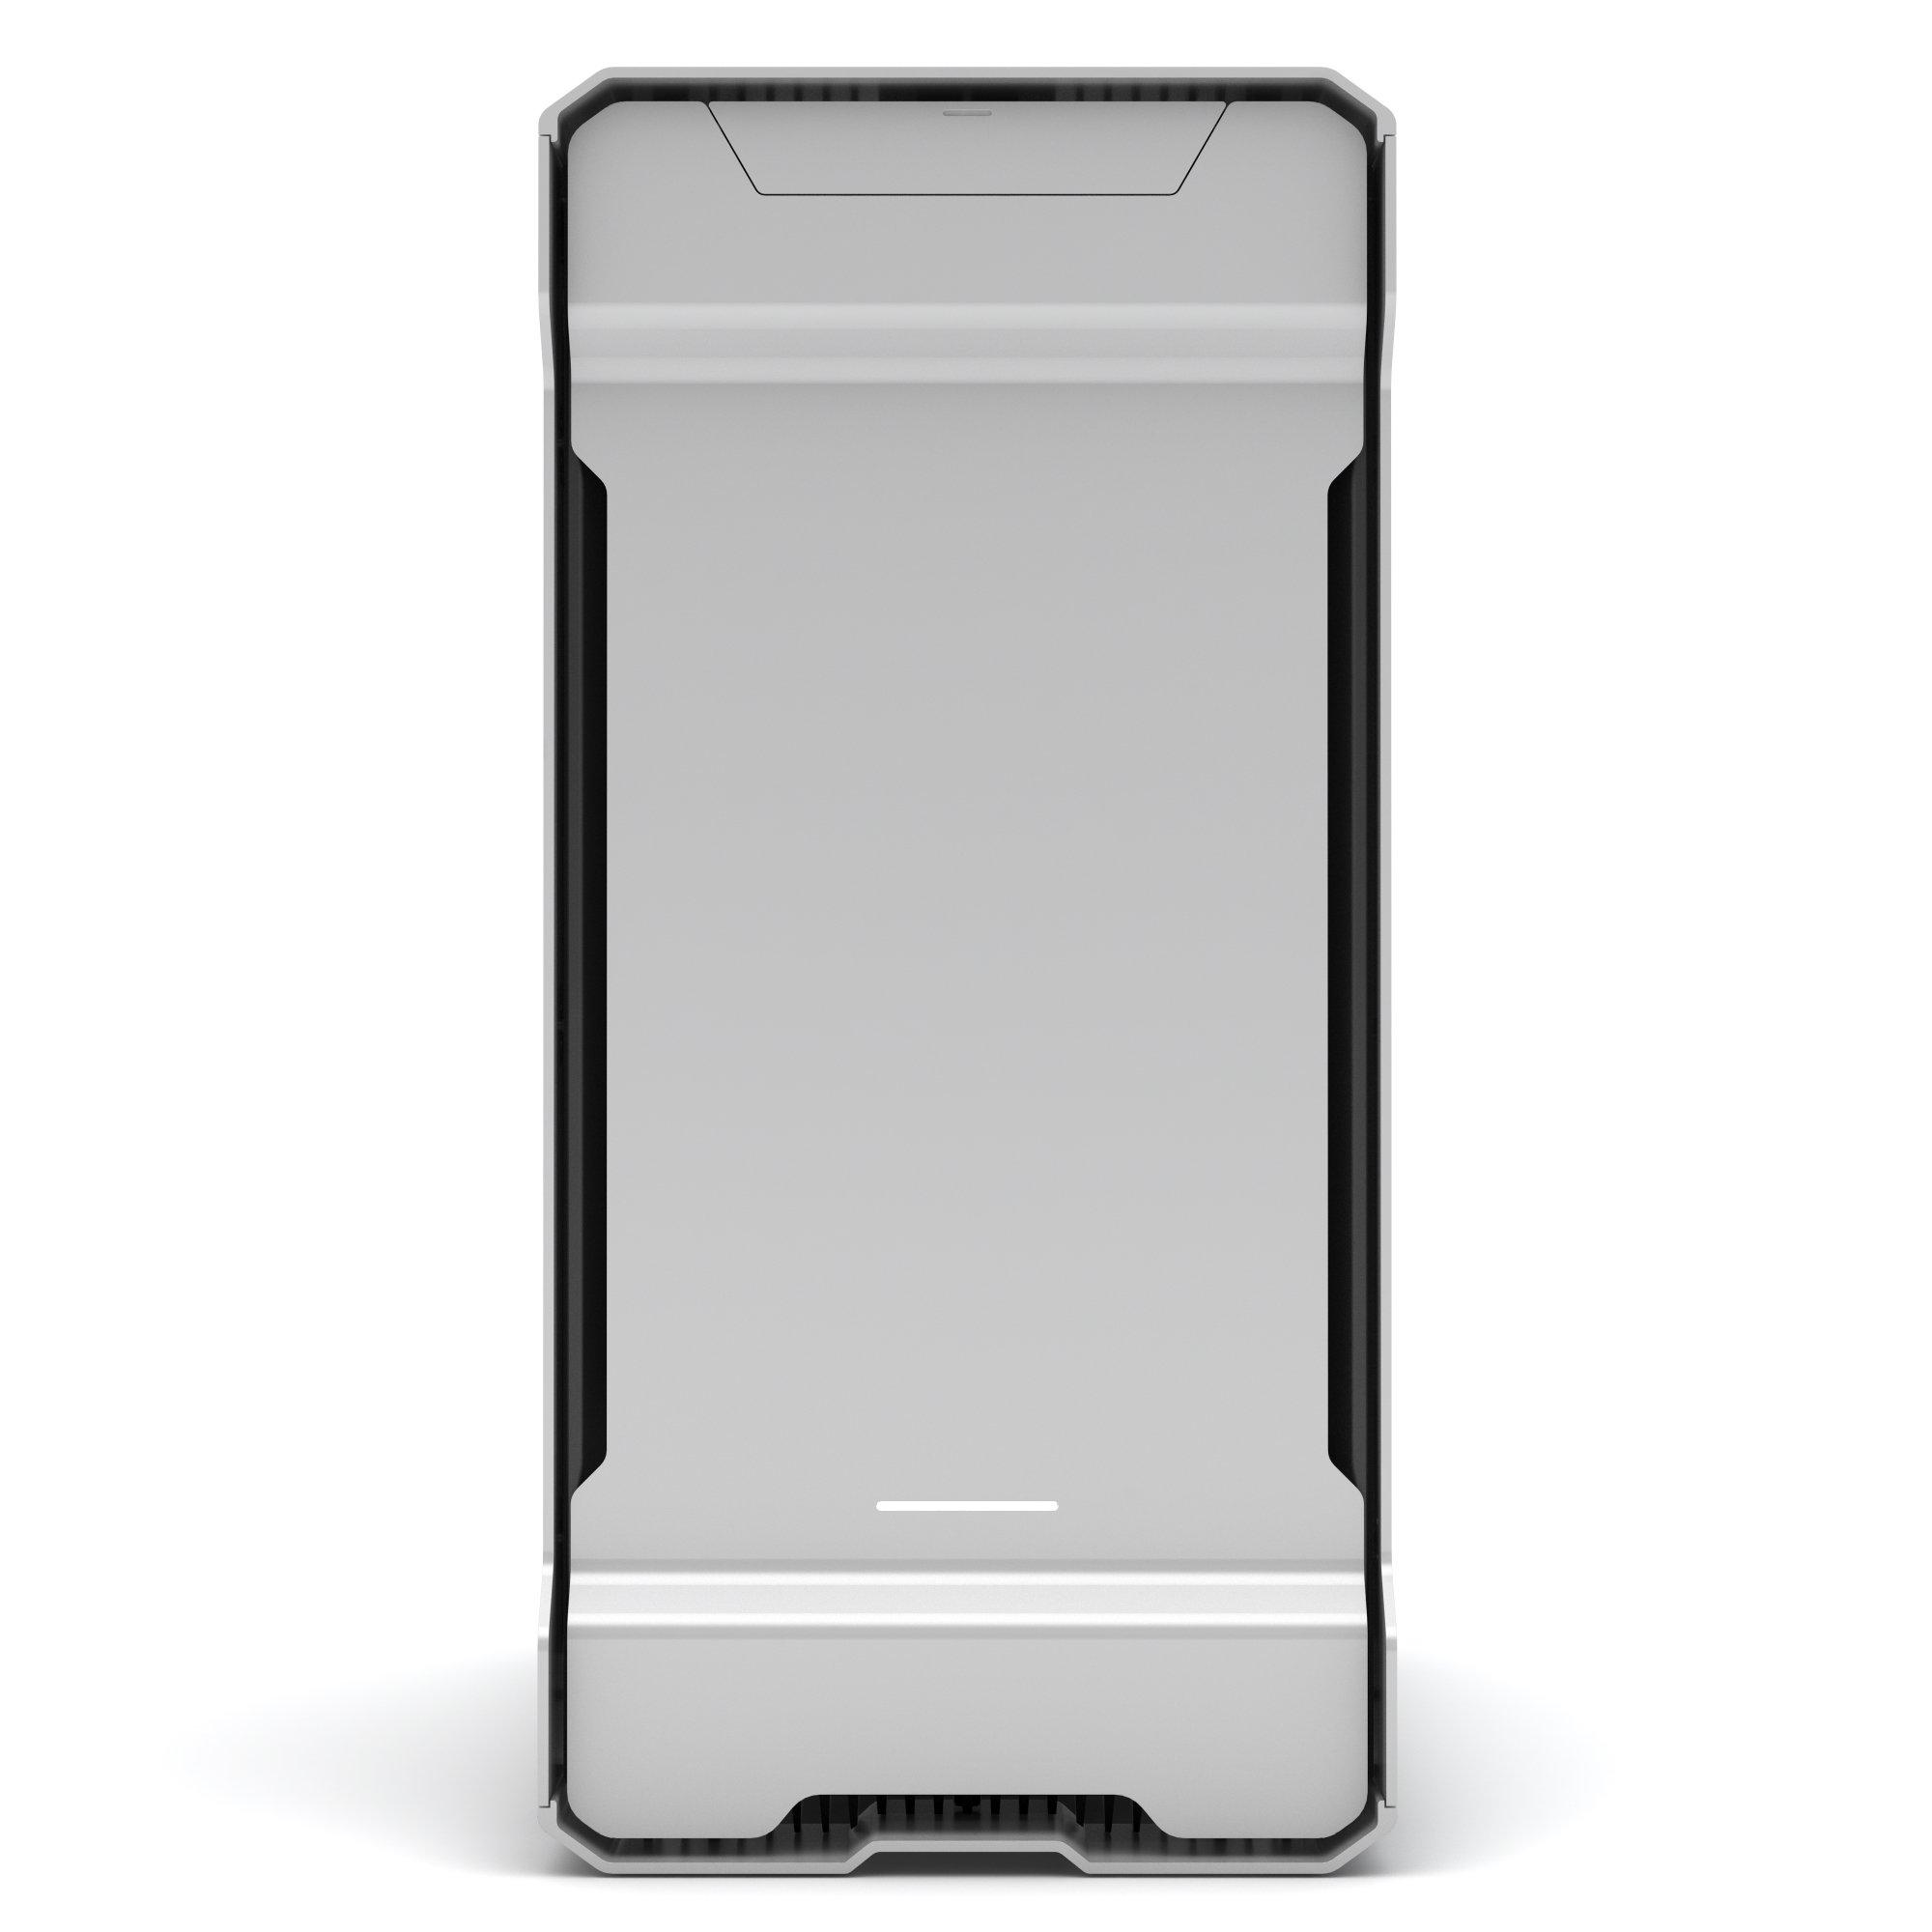 Phanteks Enthoo Evolv ATX Alum/Steel Tower Computer Case, Window (PH-ES515E_GS) Galaxy Silver by Phanteks (Image #5)